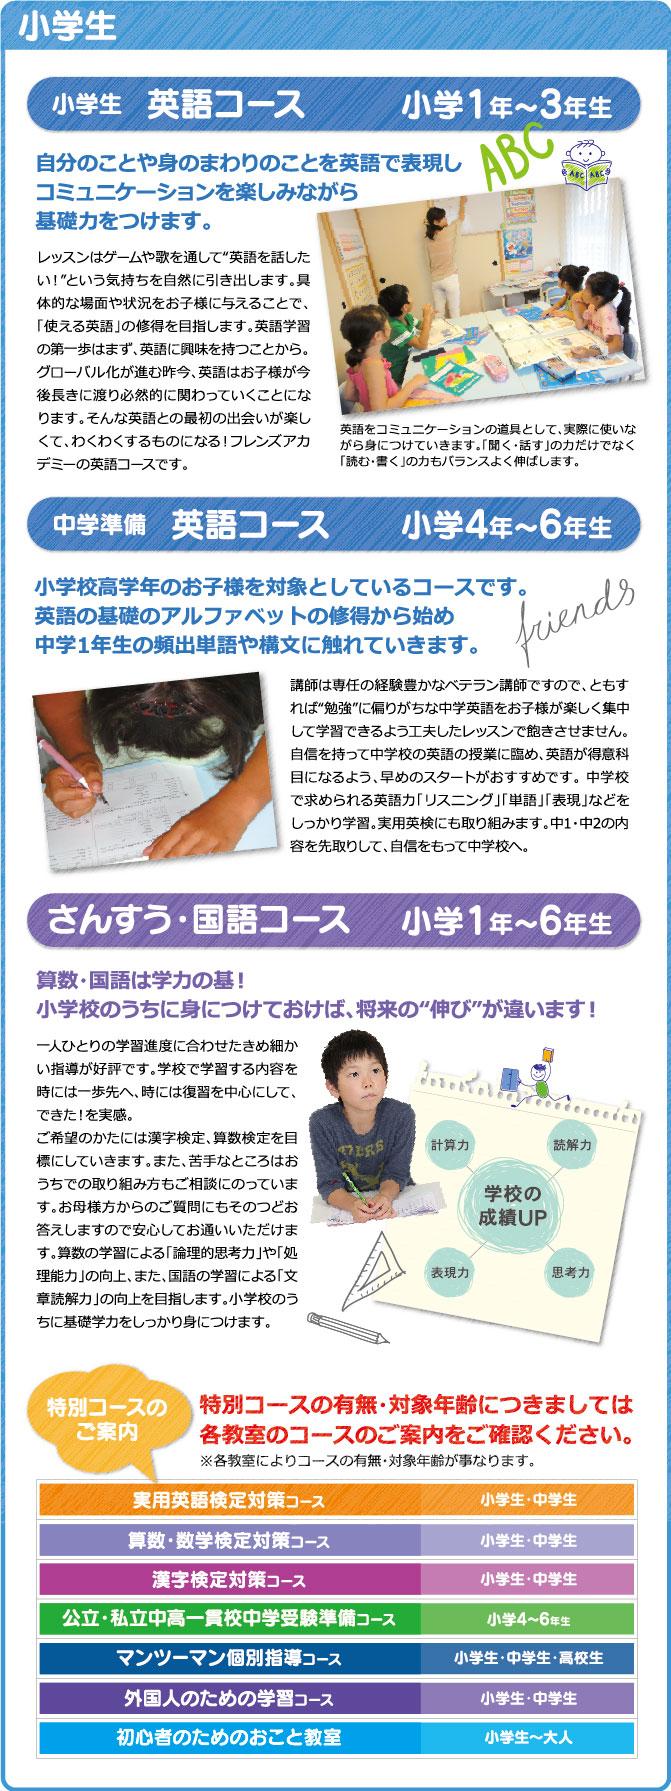 Elementaryschoolcourse